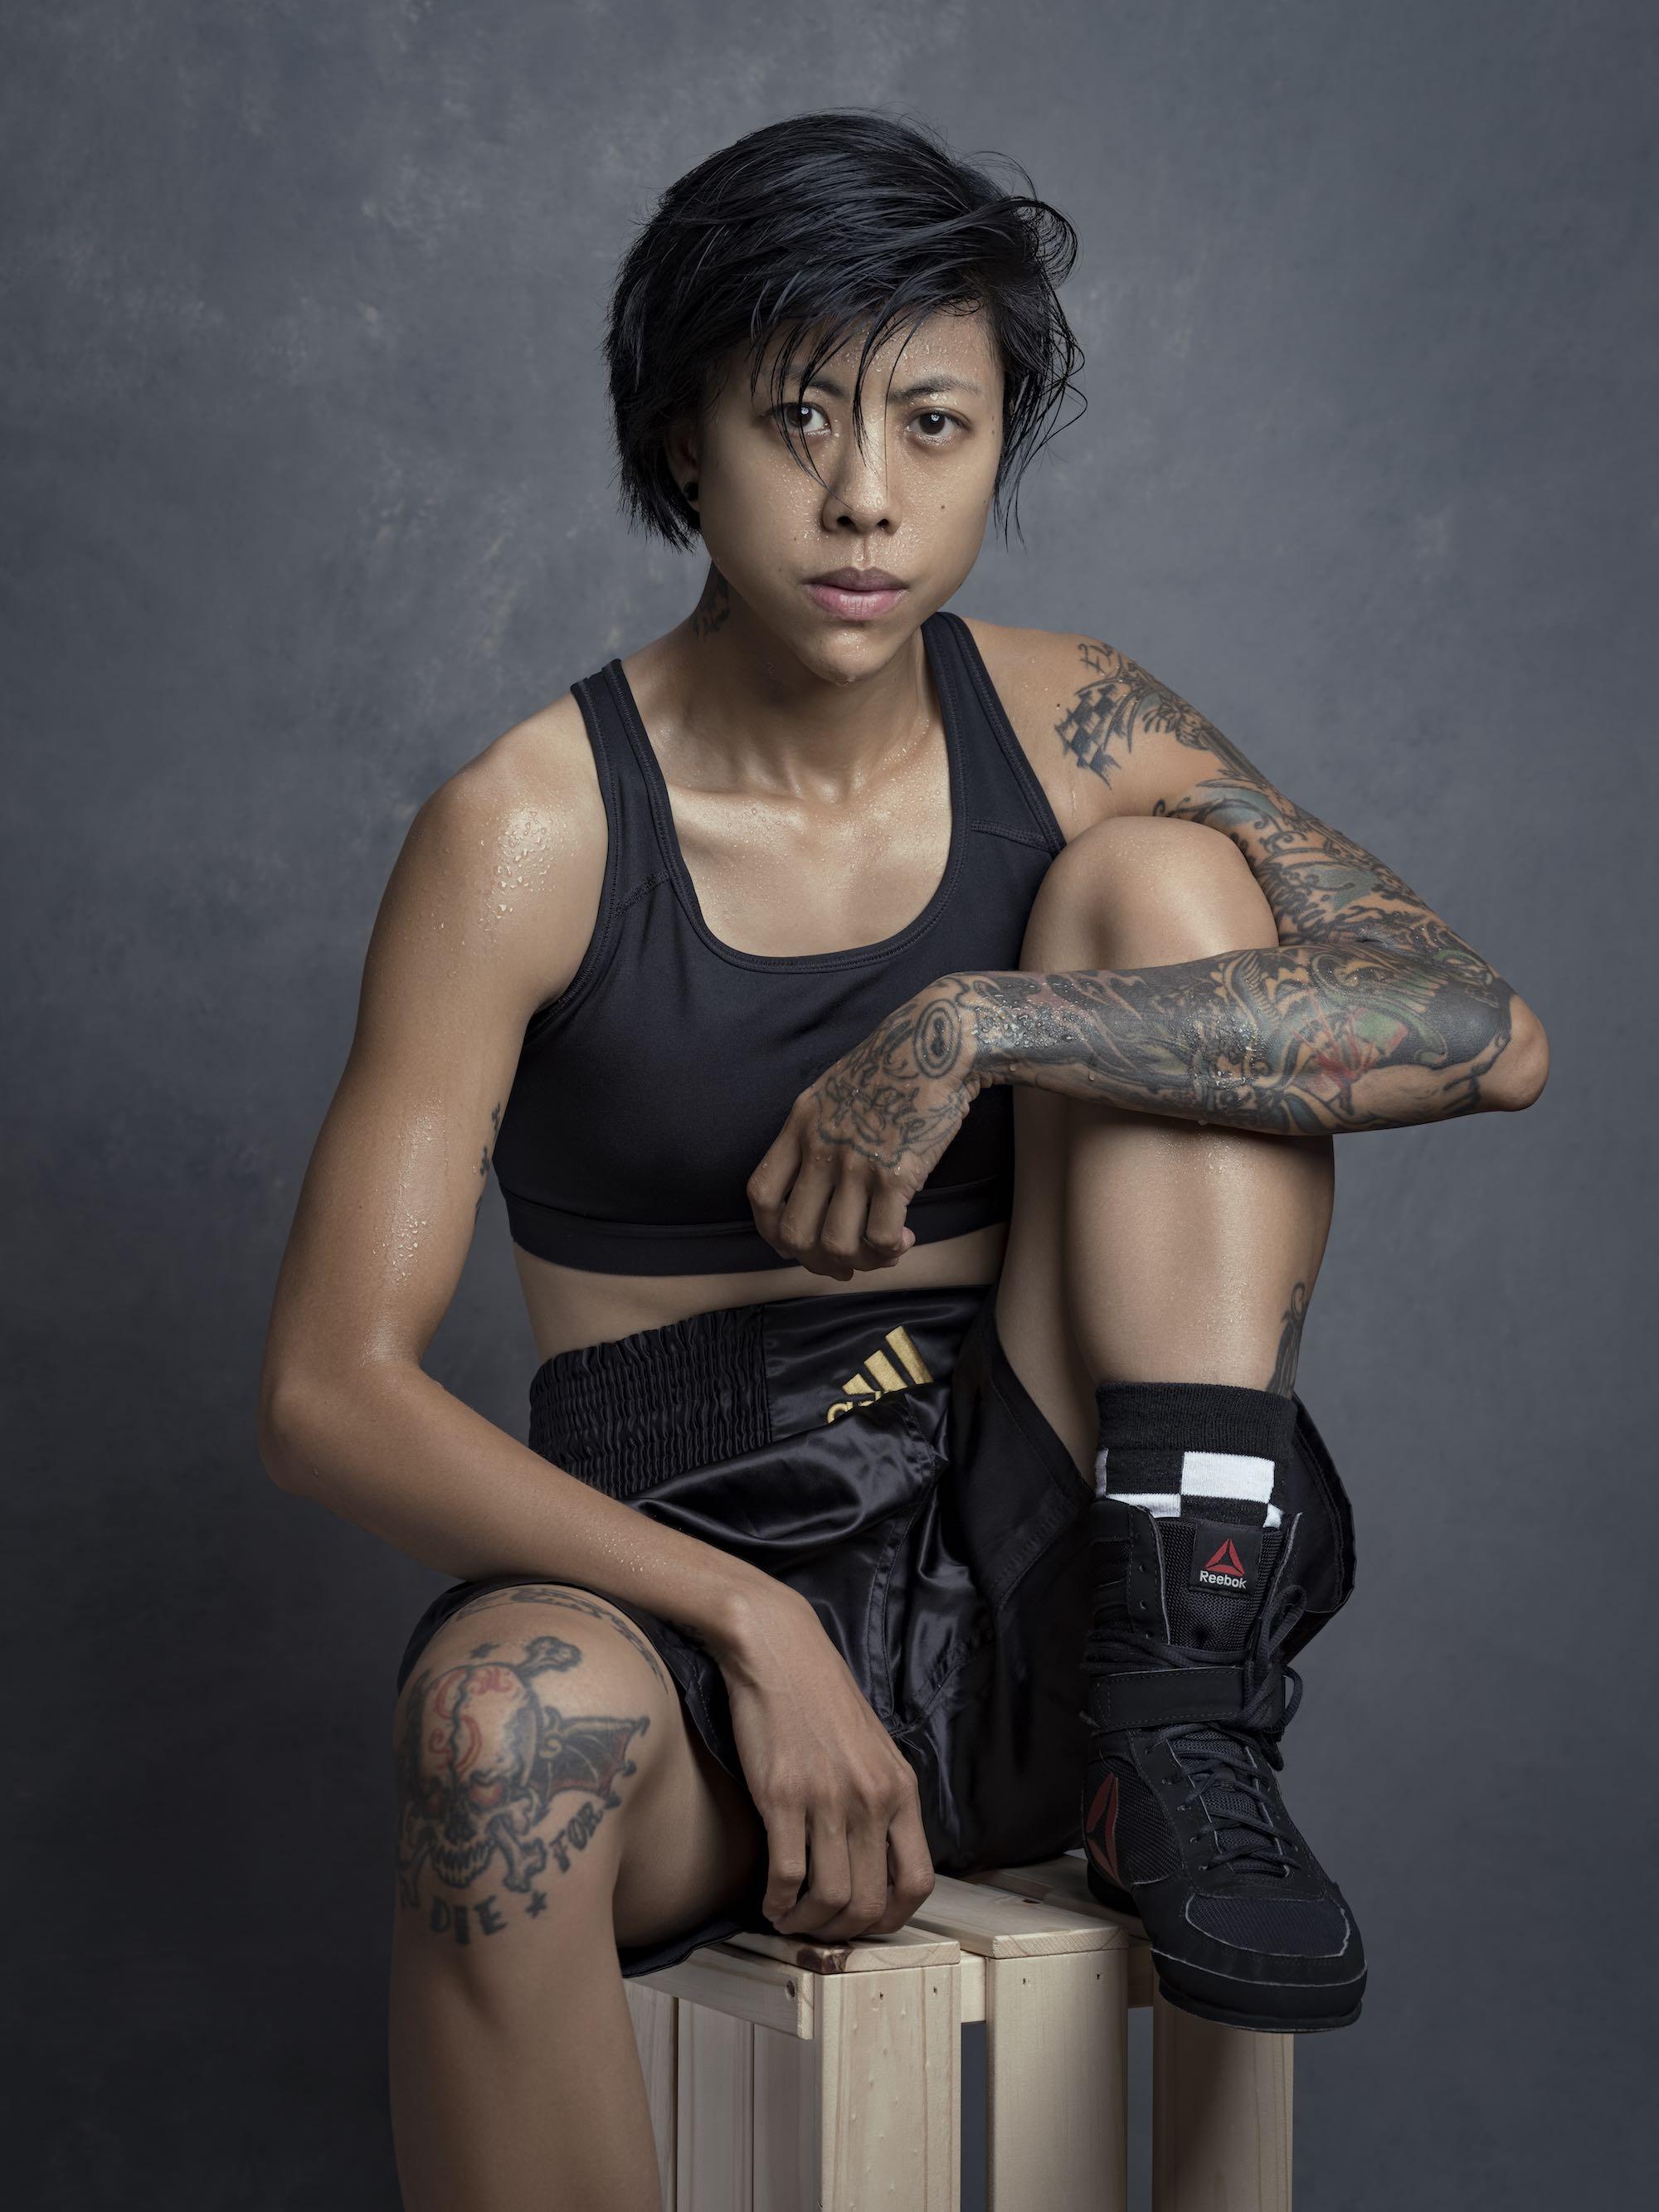 boxe sport model Asia Commercial Editorial Portraiture Documentary Photographer fujifilm Director Singapore Jose Jeuland photography fashion